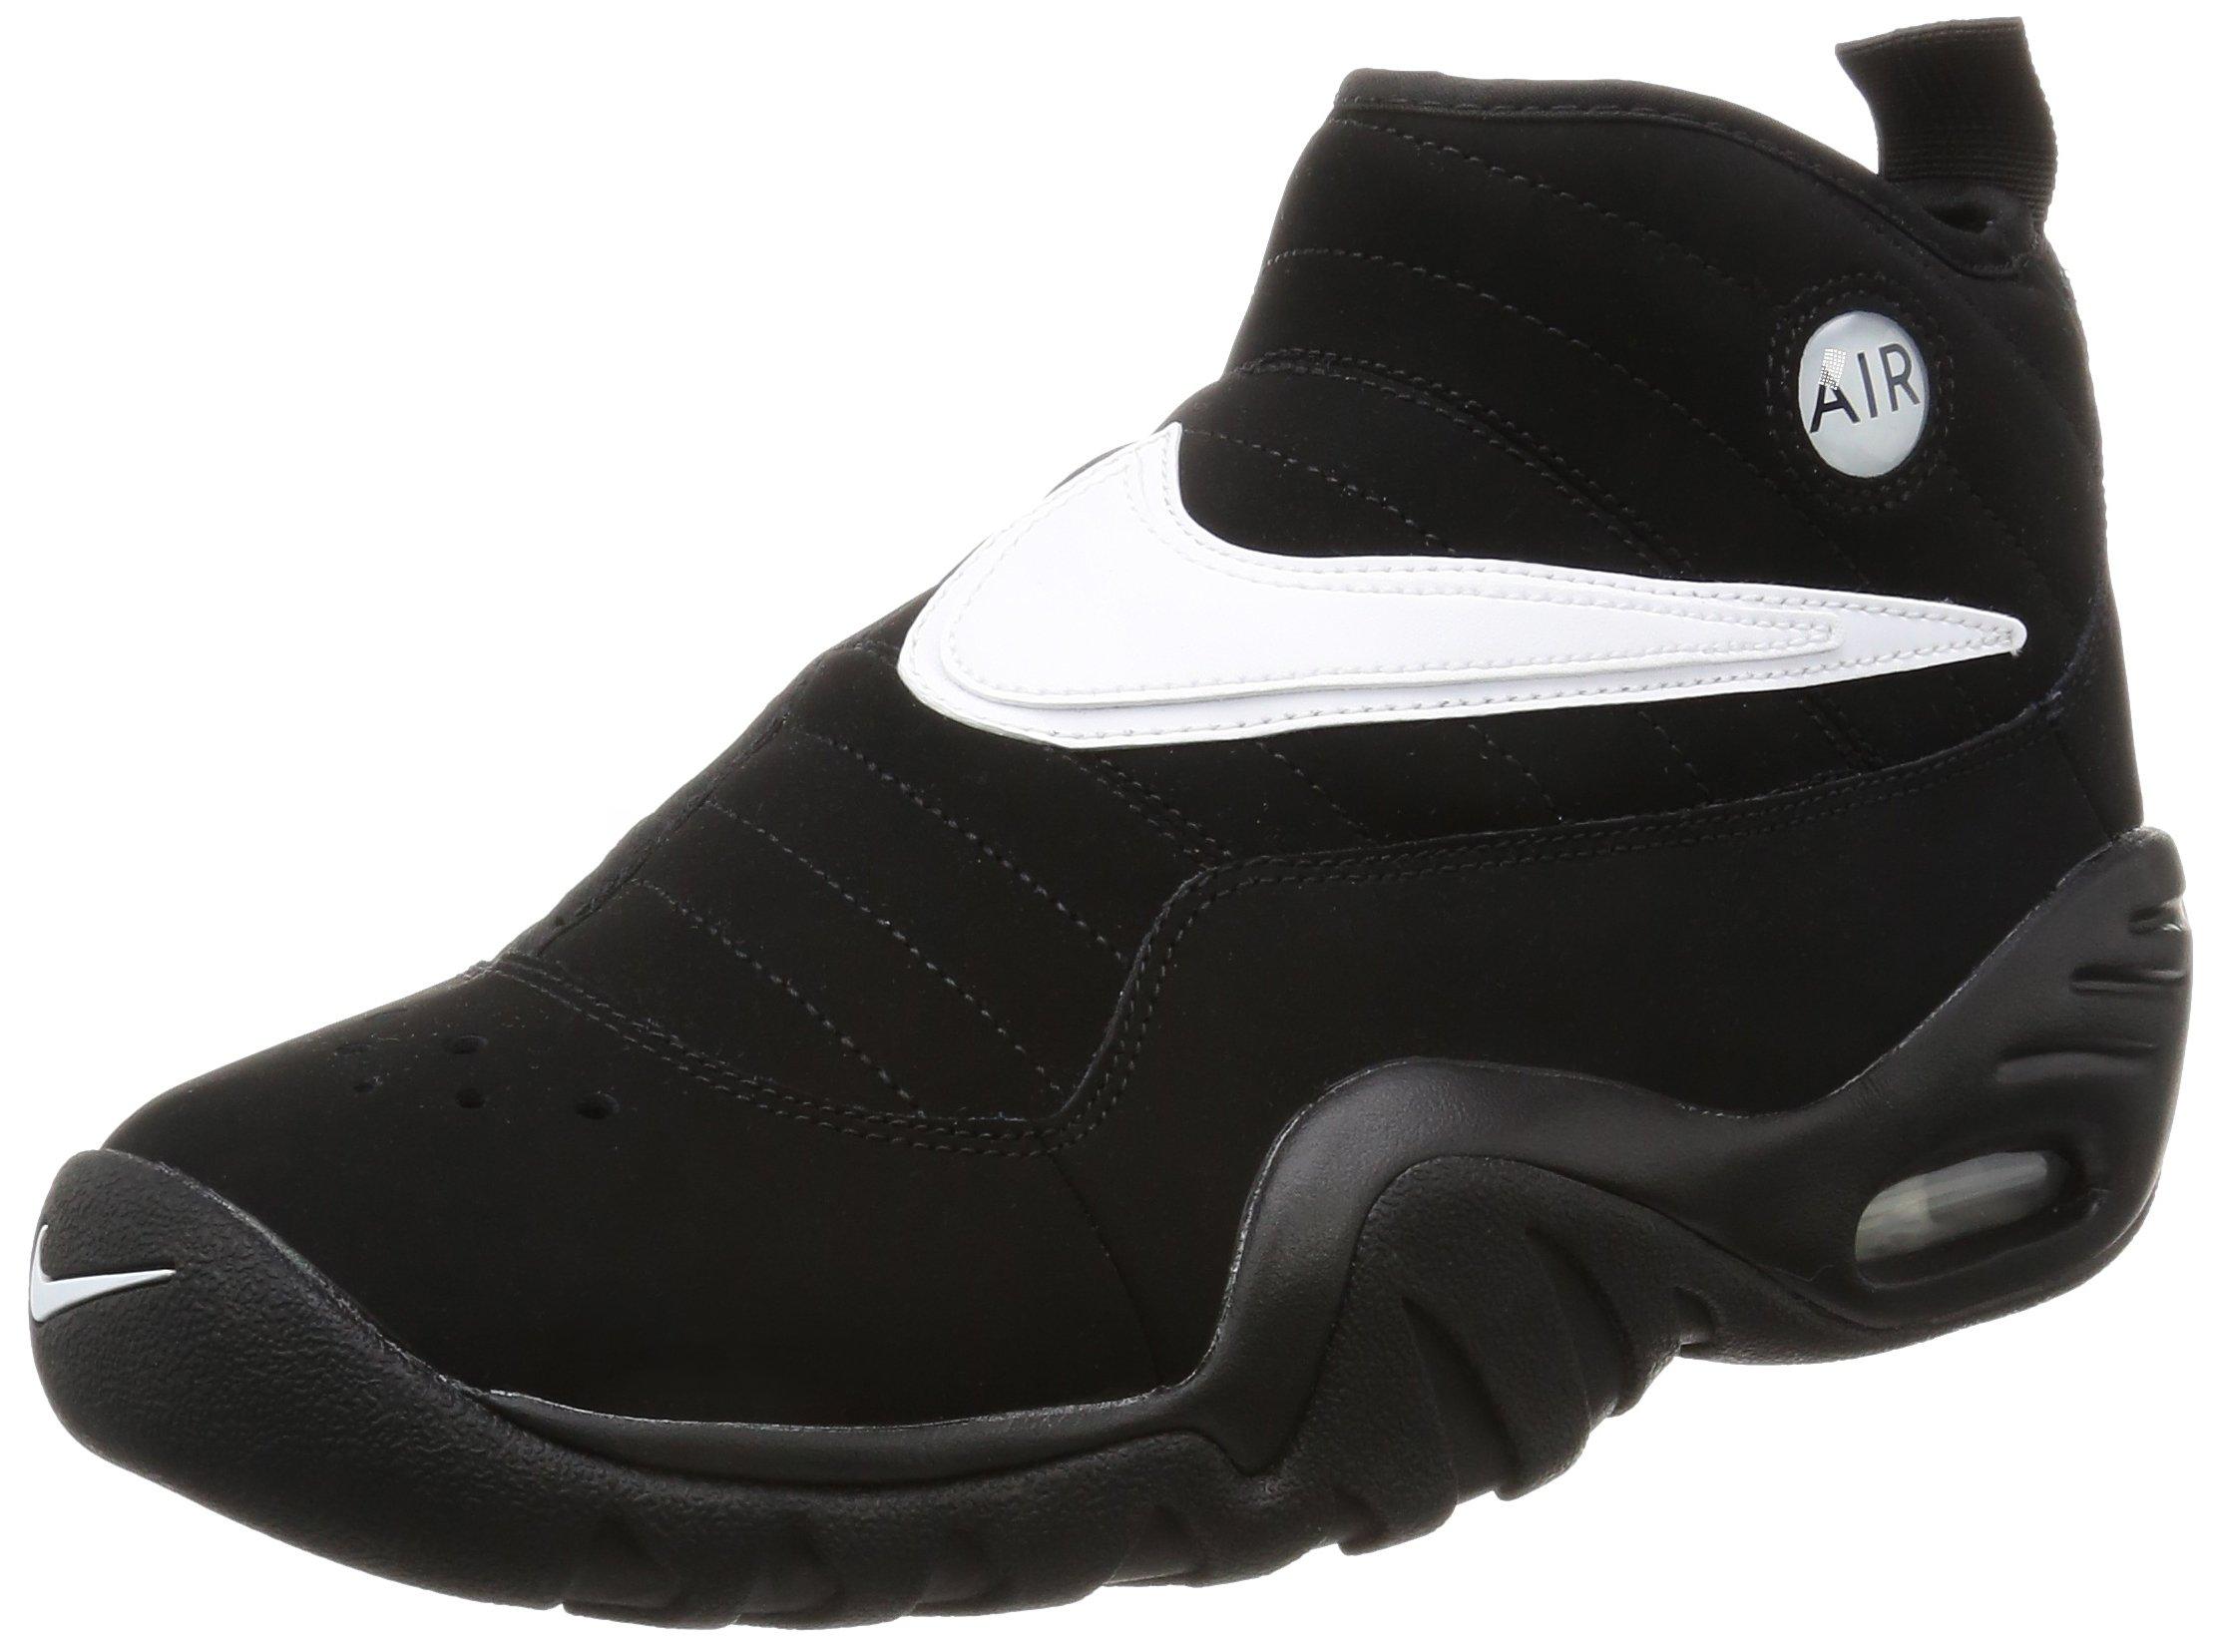 Nike Men's Air Shake Ndestrukt Shoe, Black/Black/Team Orange/White, 8.5 D(M) US